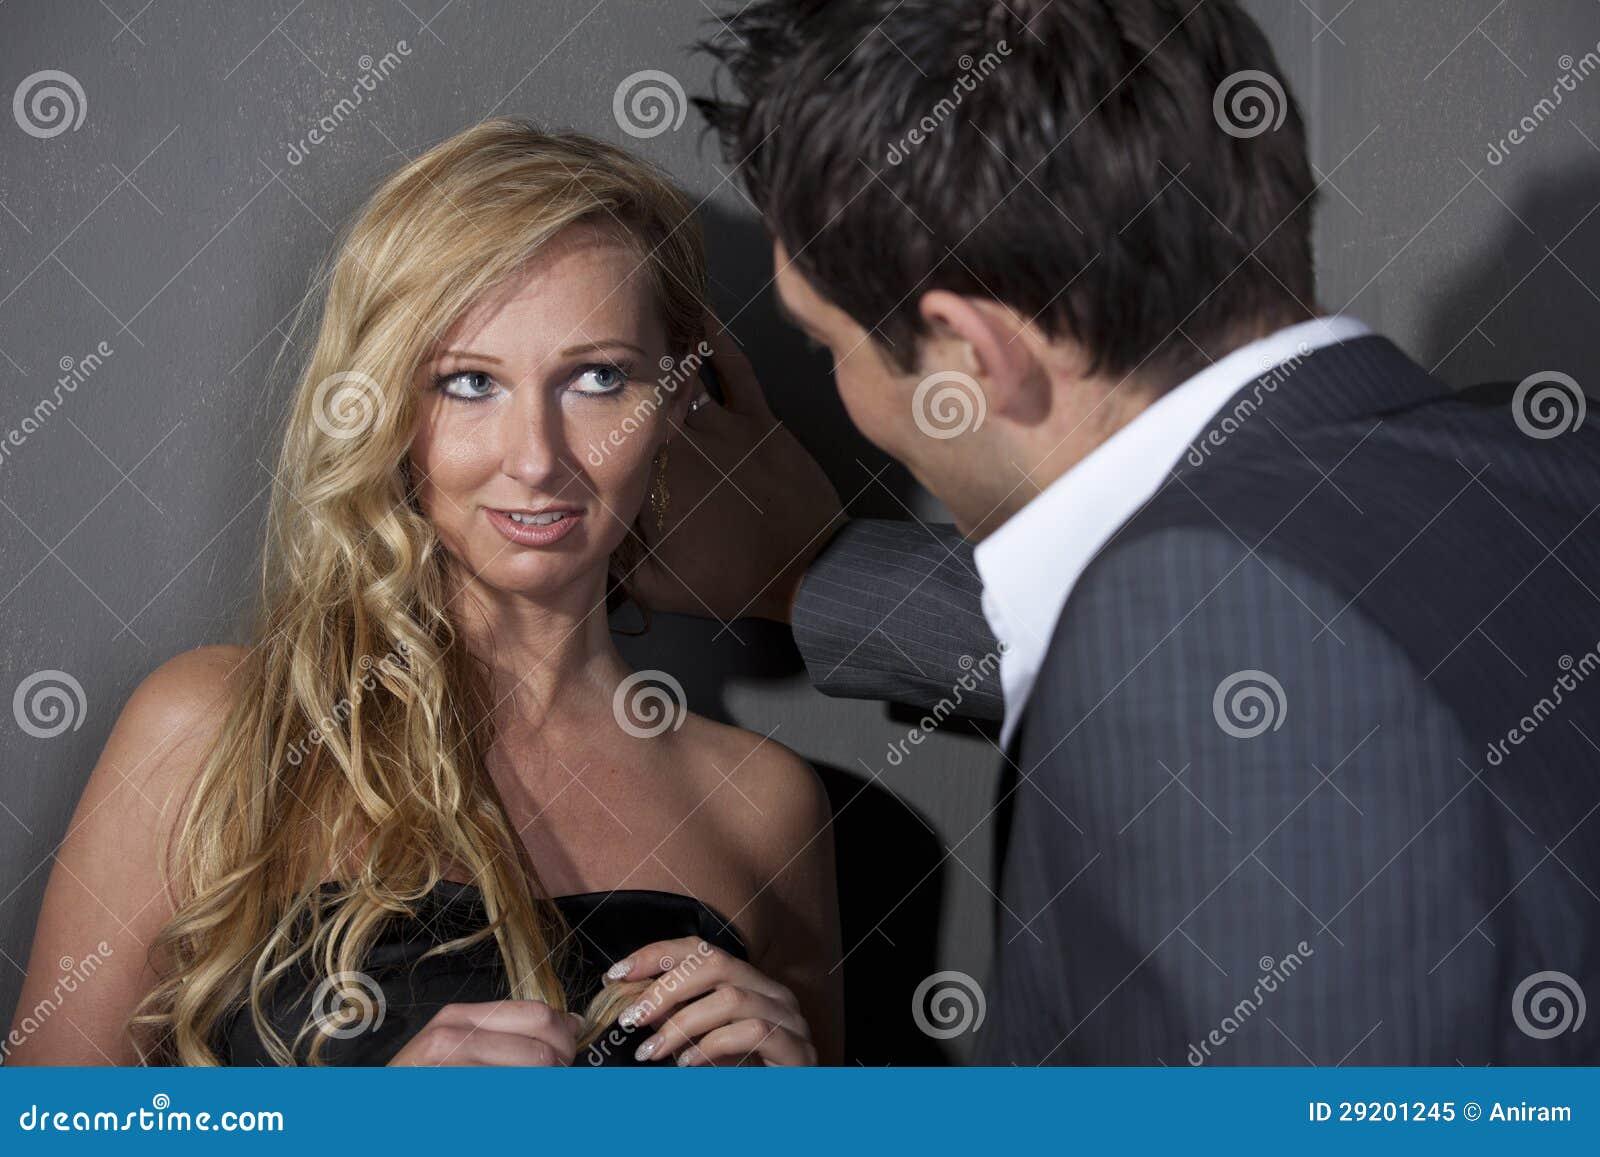 Flirting free